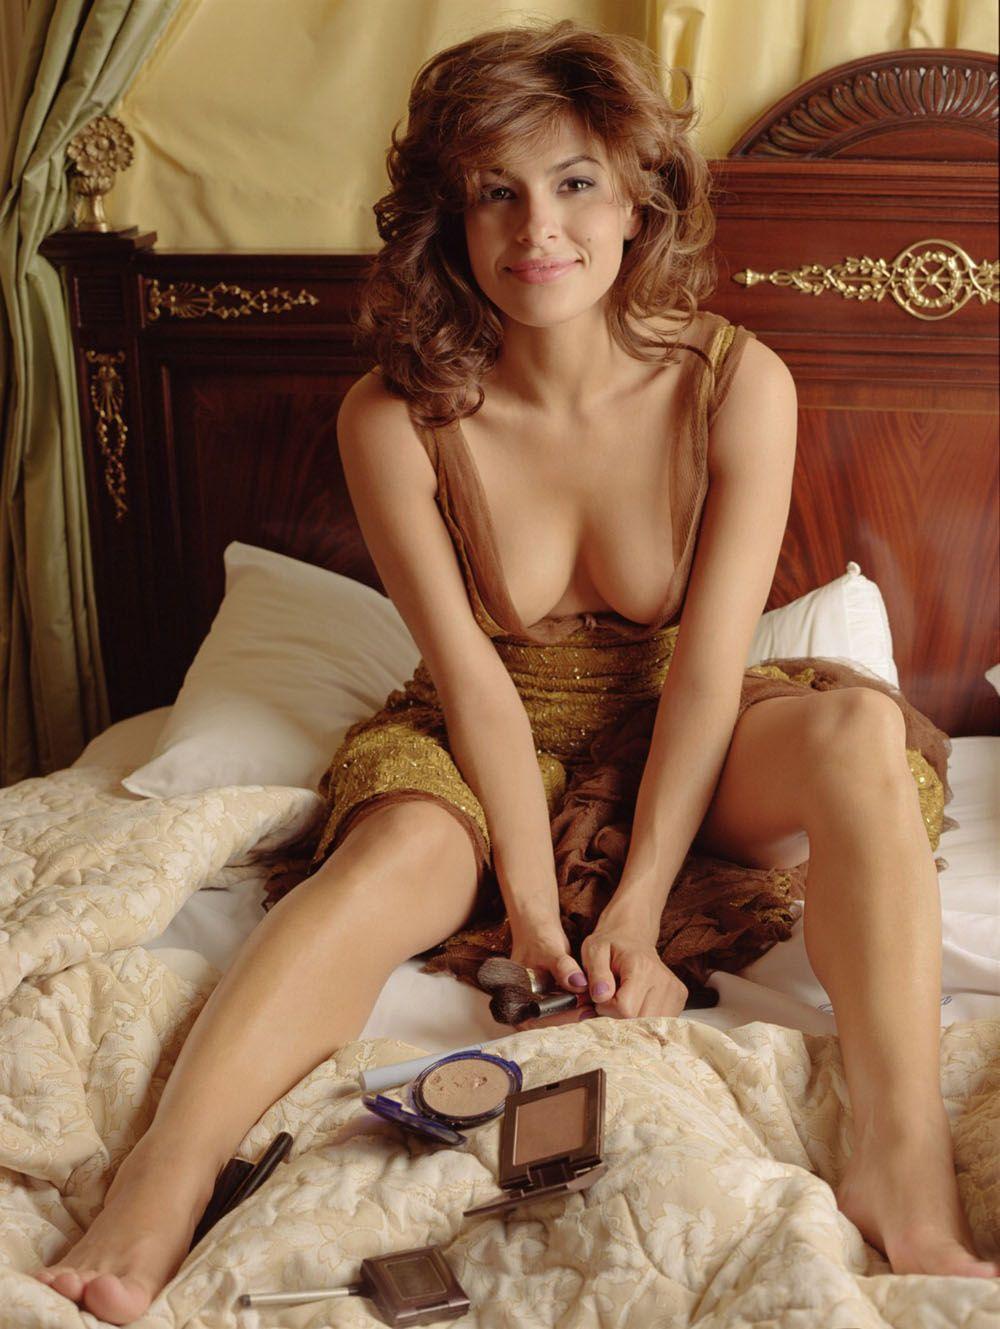 Erotica Eva Mendes nude photos 2019